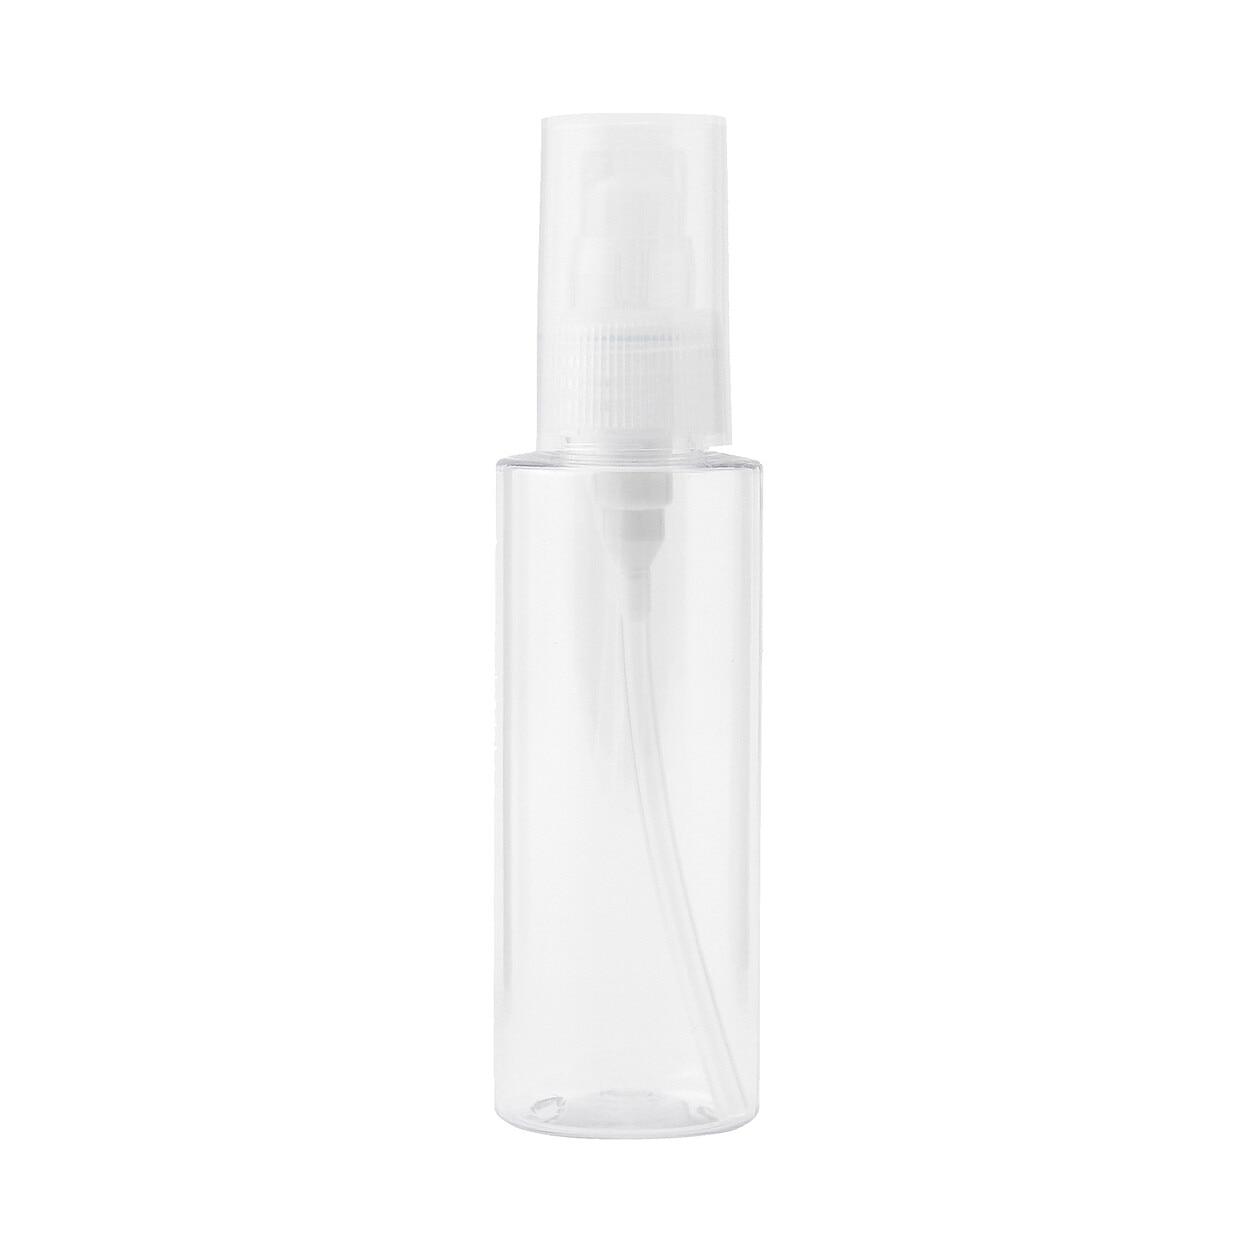 PET分裝瓶/按壓型 100ml | 無印良品